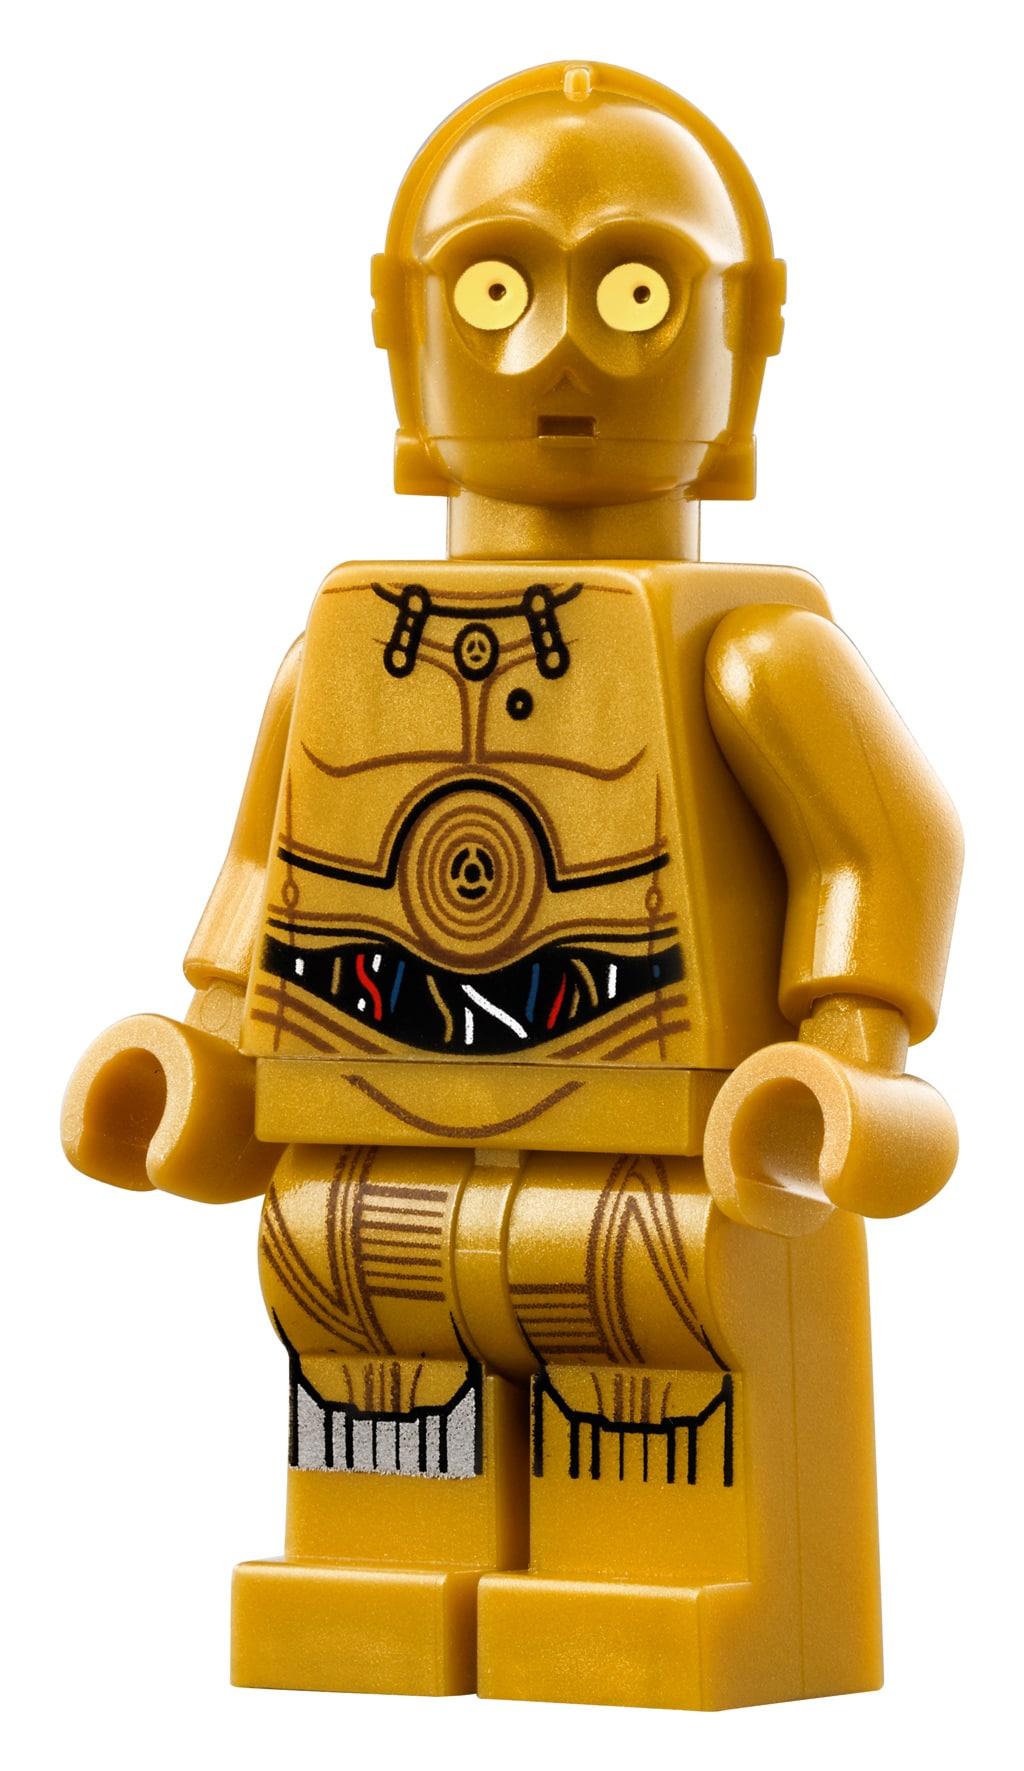 C-3PO 75192 UCS Millennium Falcon